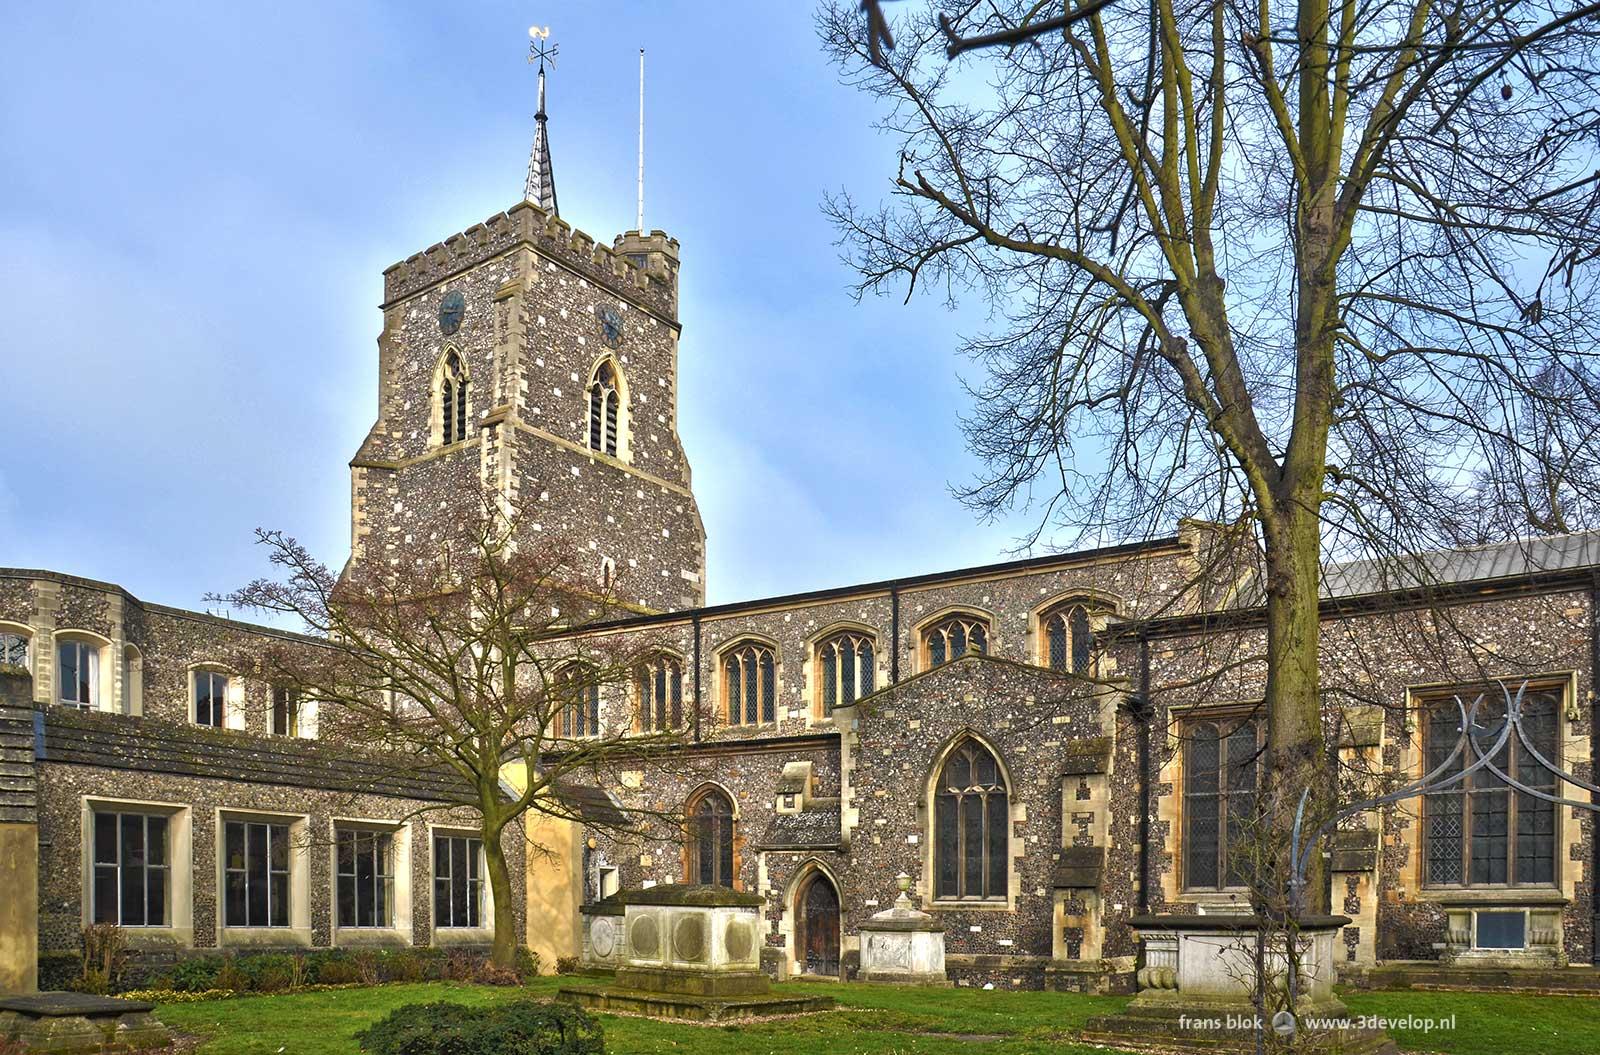 Foto van St.Mary's church in Watford met de omliggende tuin, vroeg in het voorjaar